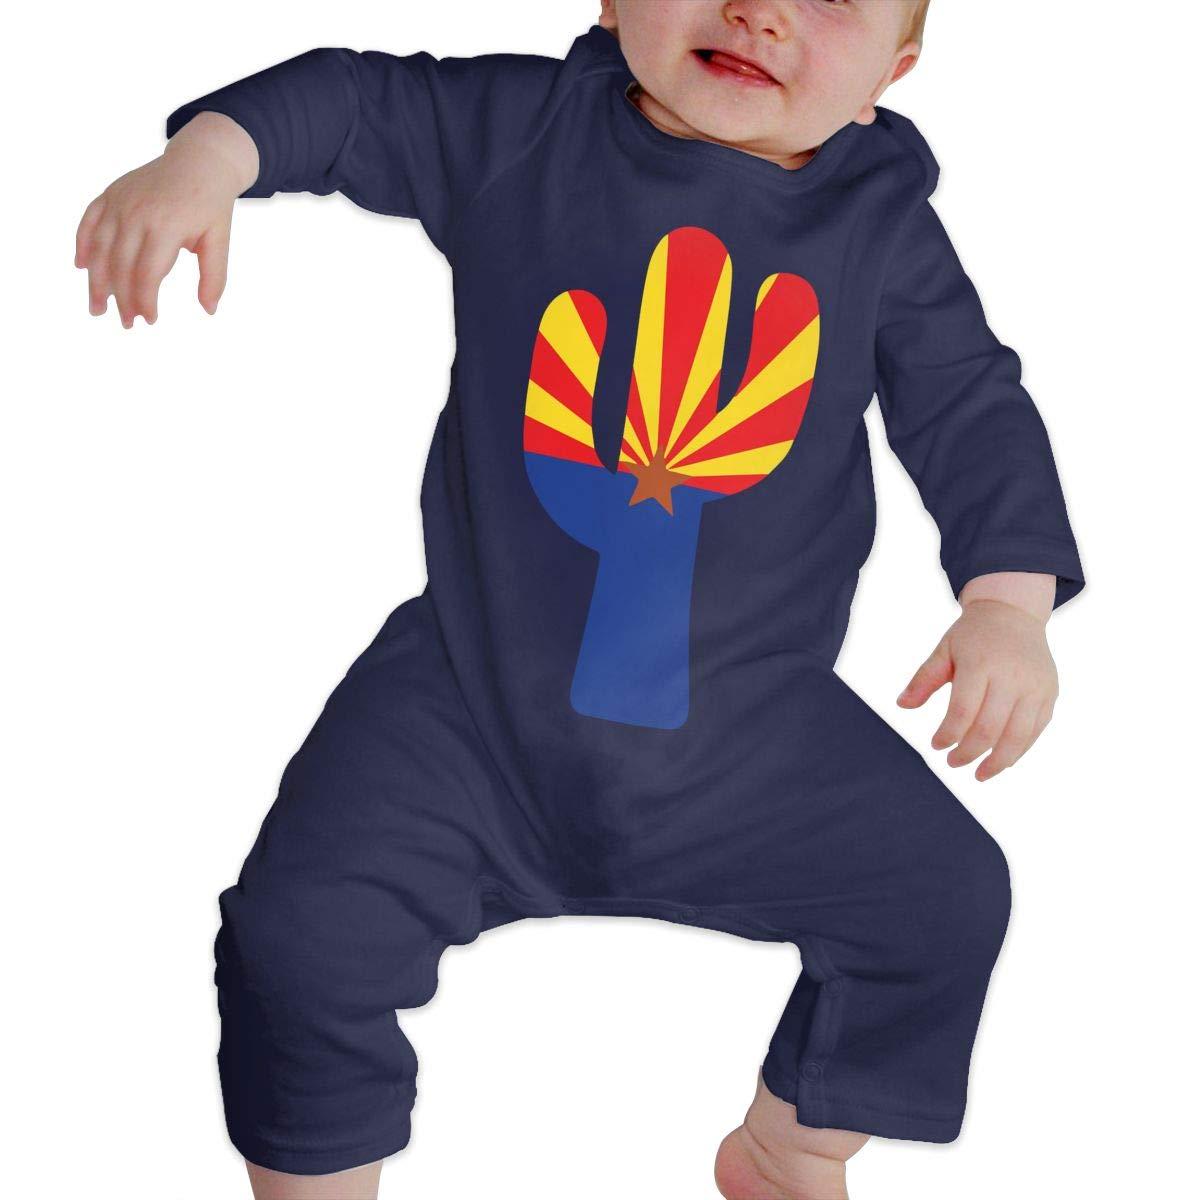 Arizona Flag in A Saguaro Cactus Newborn Baby Girl Infant Essential Basic Coveralls Jumpsuits